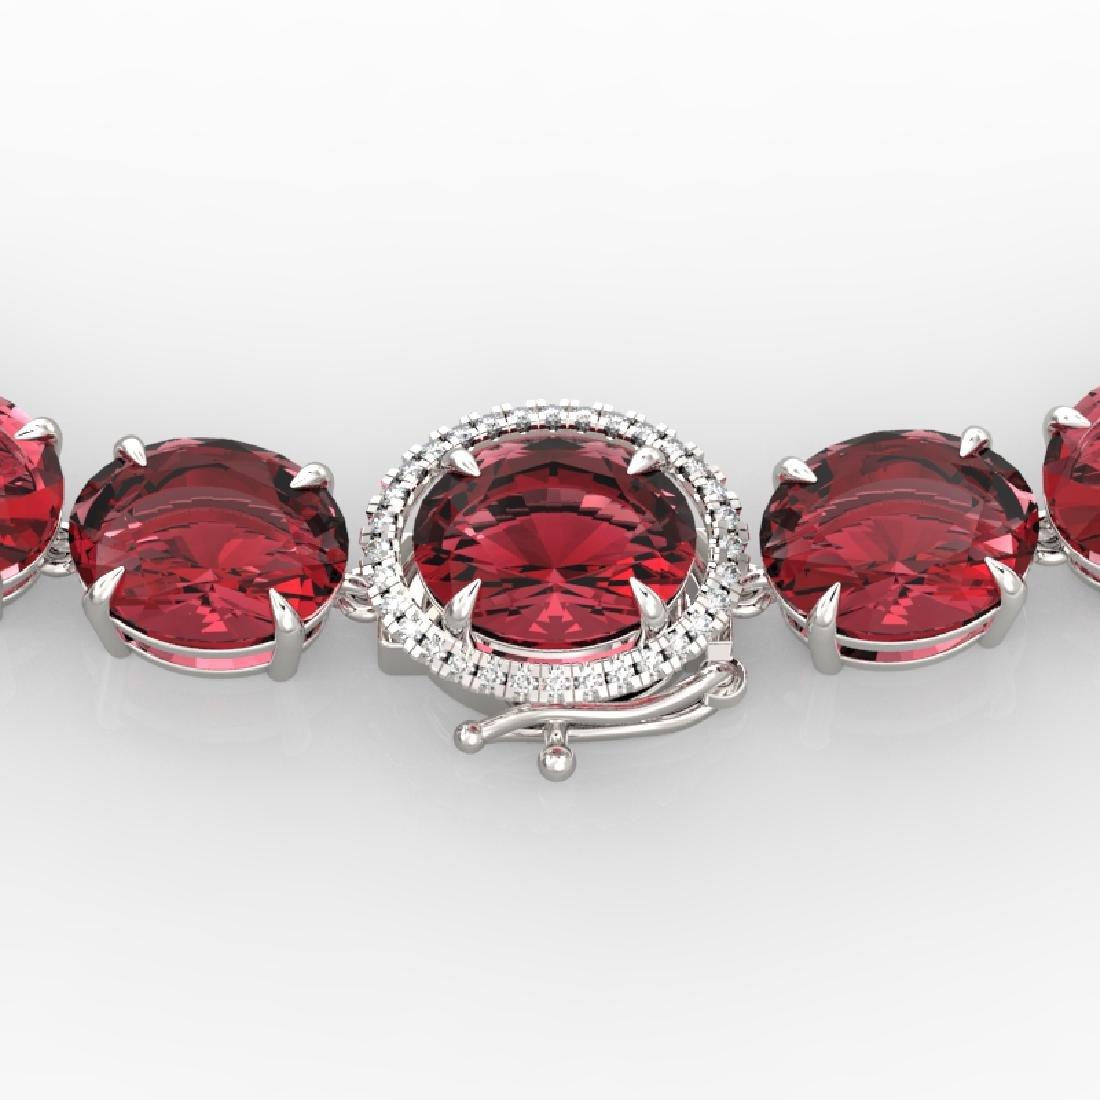 145 CTW Pink Tourmaline & VS/SI Diamond Necklace 14K